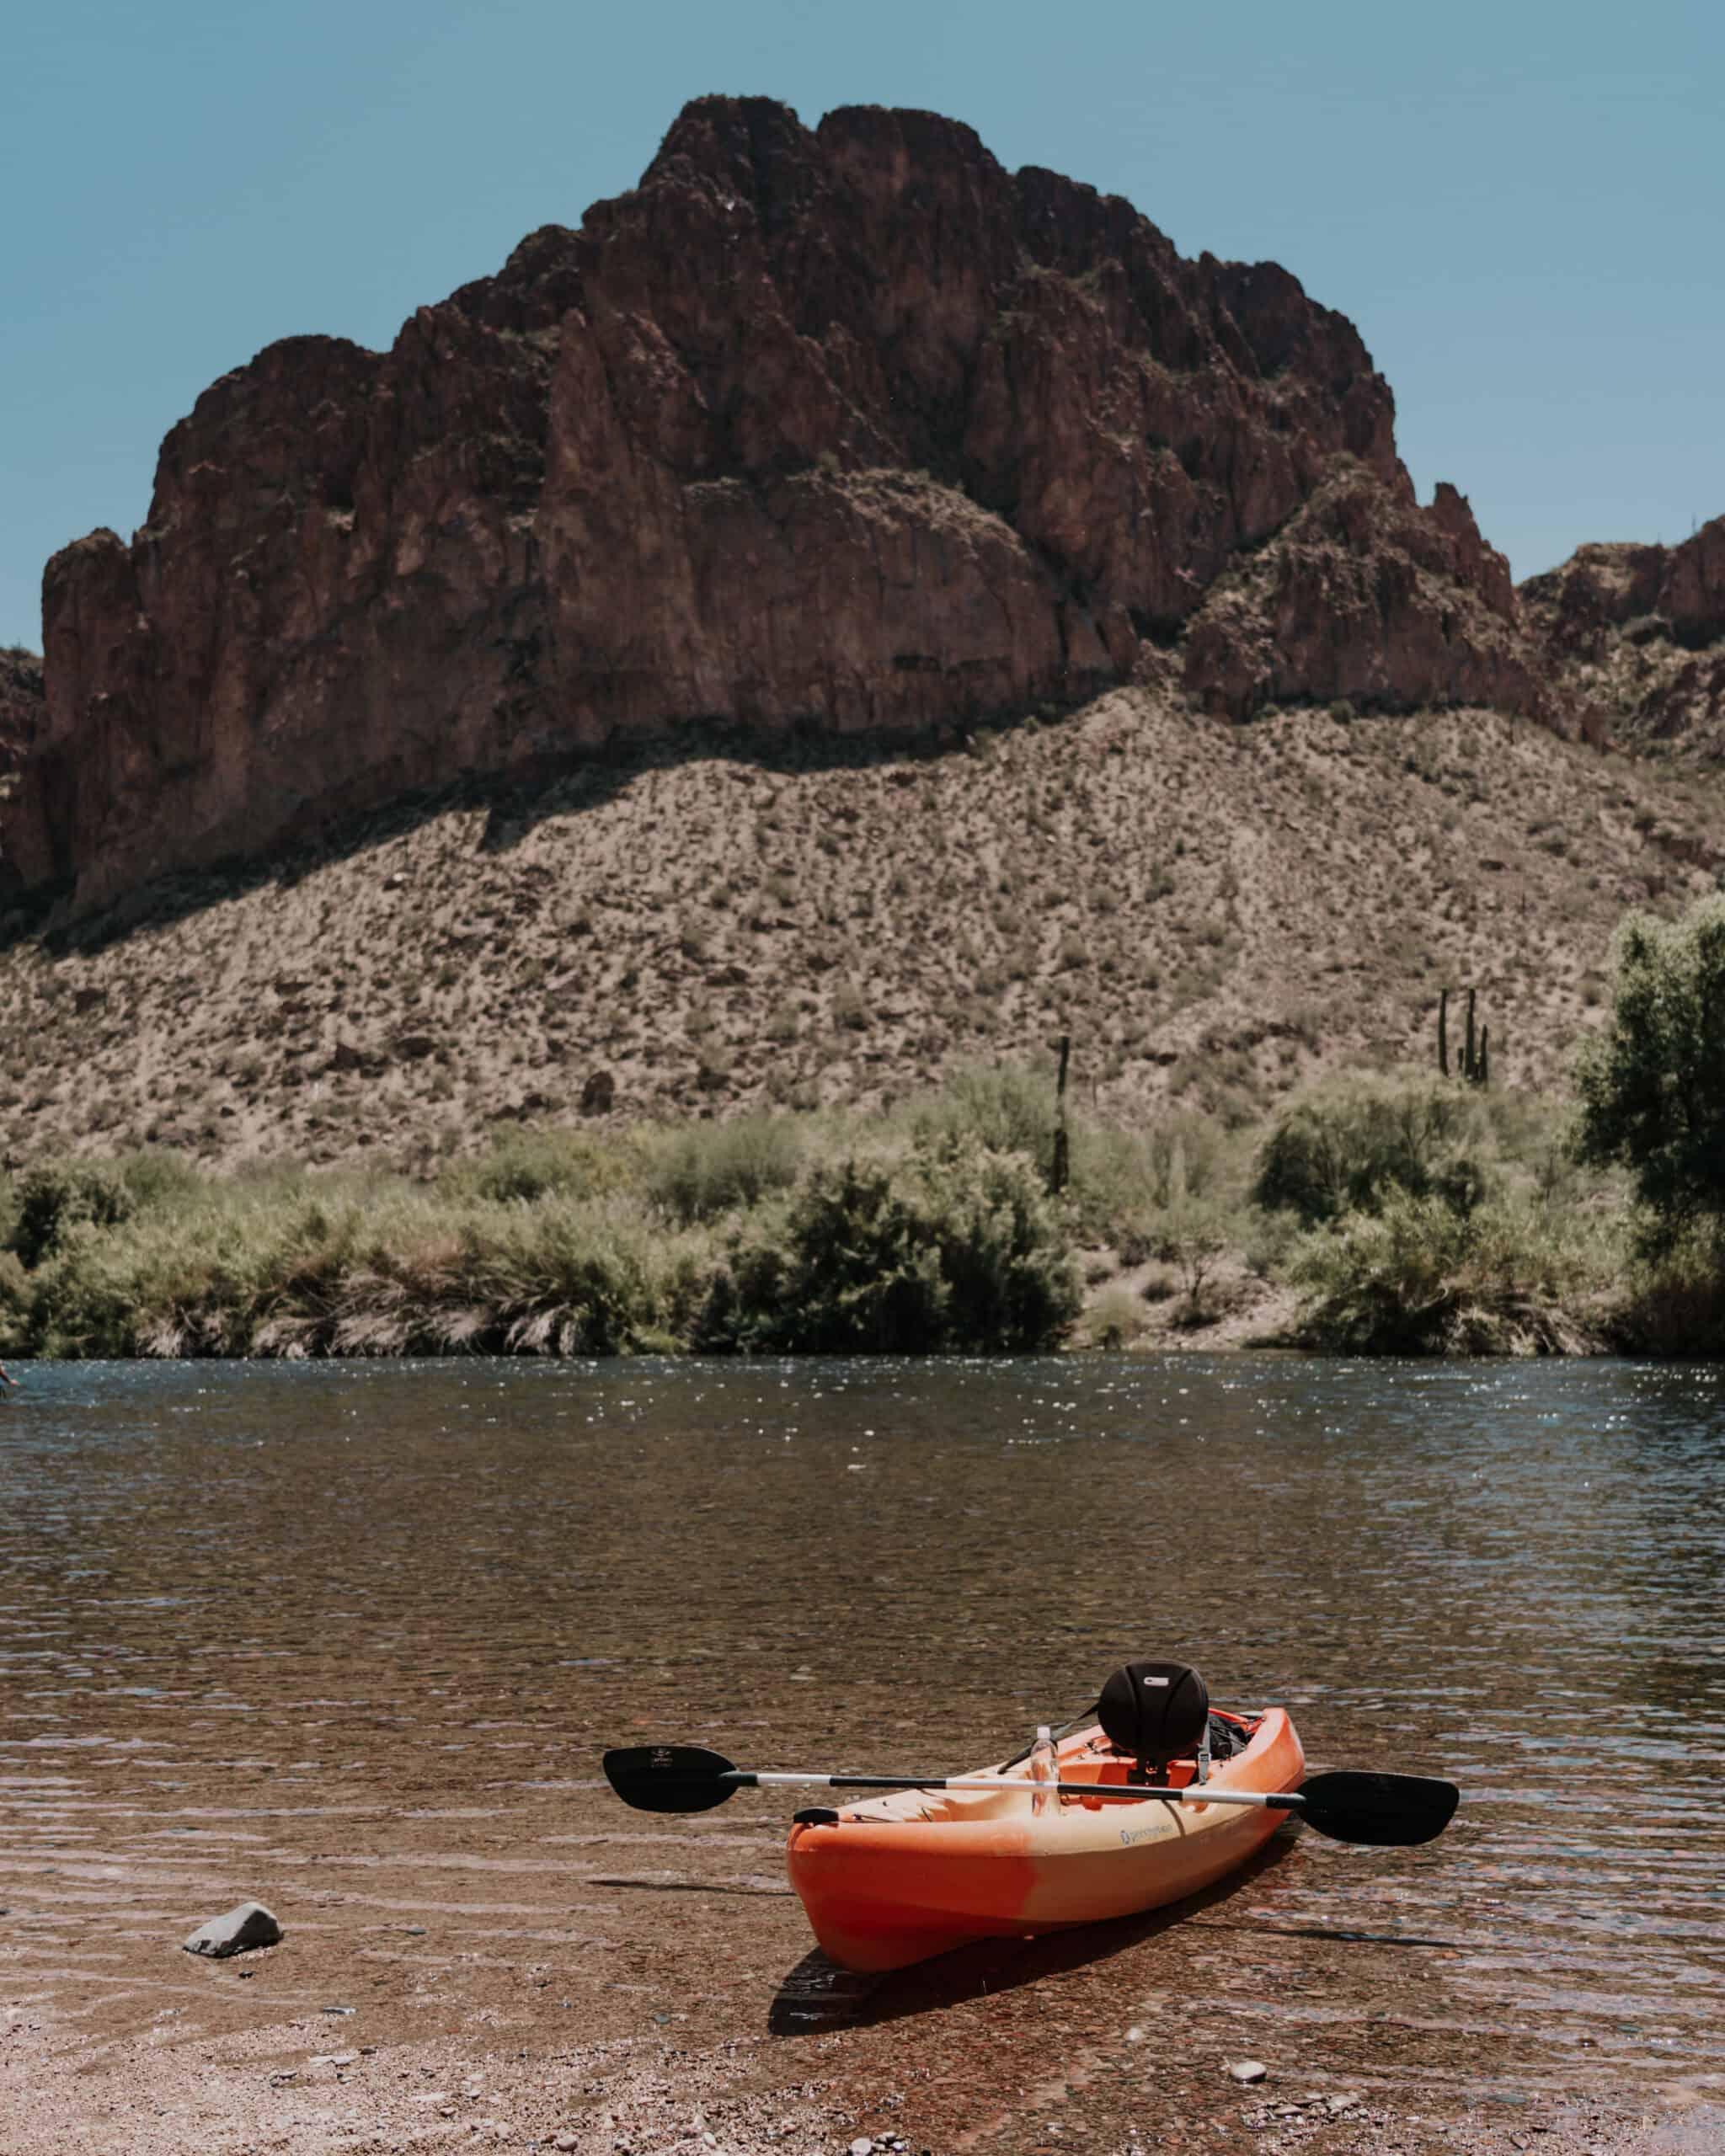 Kayaking in the Salt River